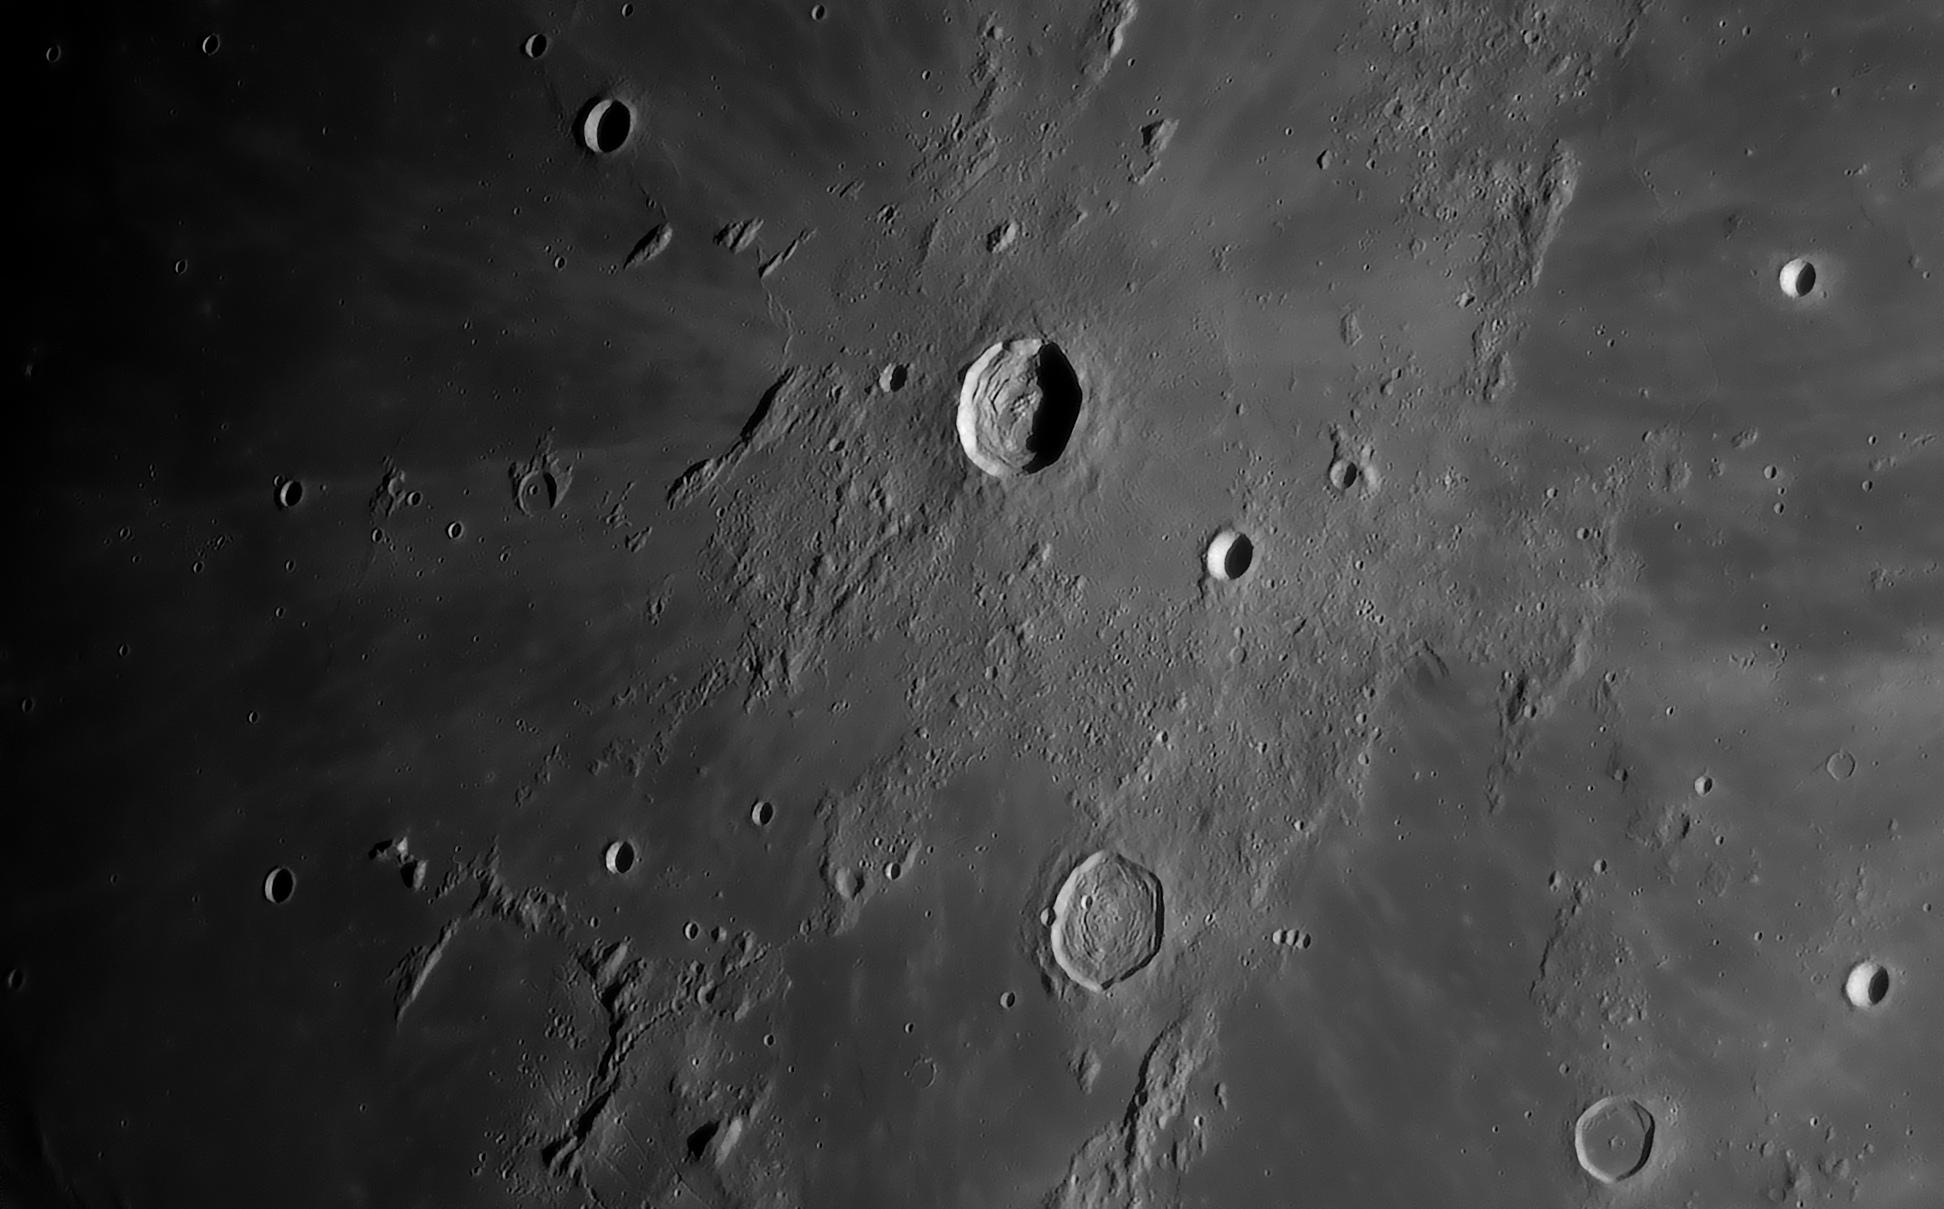 Kepler au C14, le 4 Avril 2020: 100 images, caméra 174MM, Baader FFC, ADC Pierro Astro, filtre Astronomik orange 2c